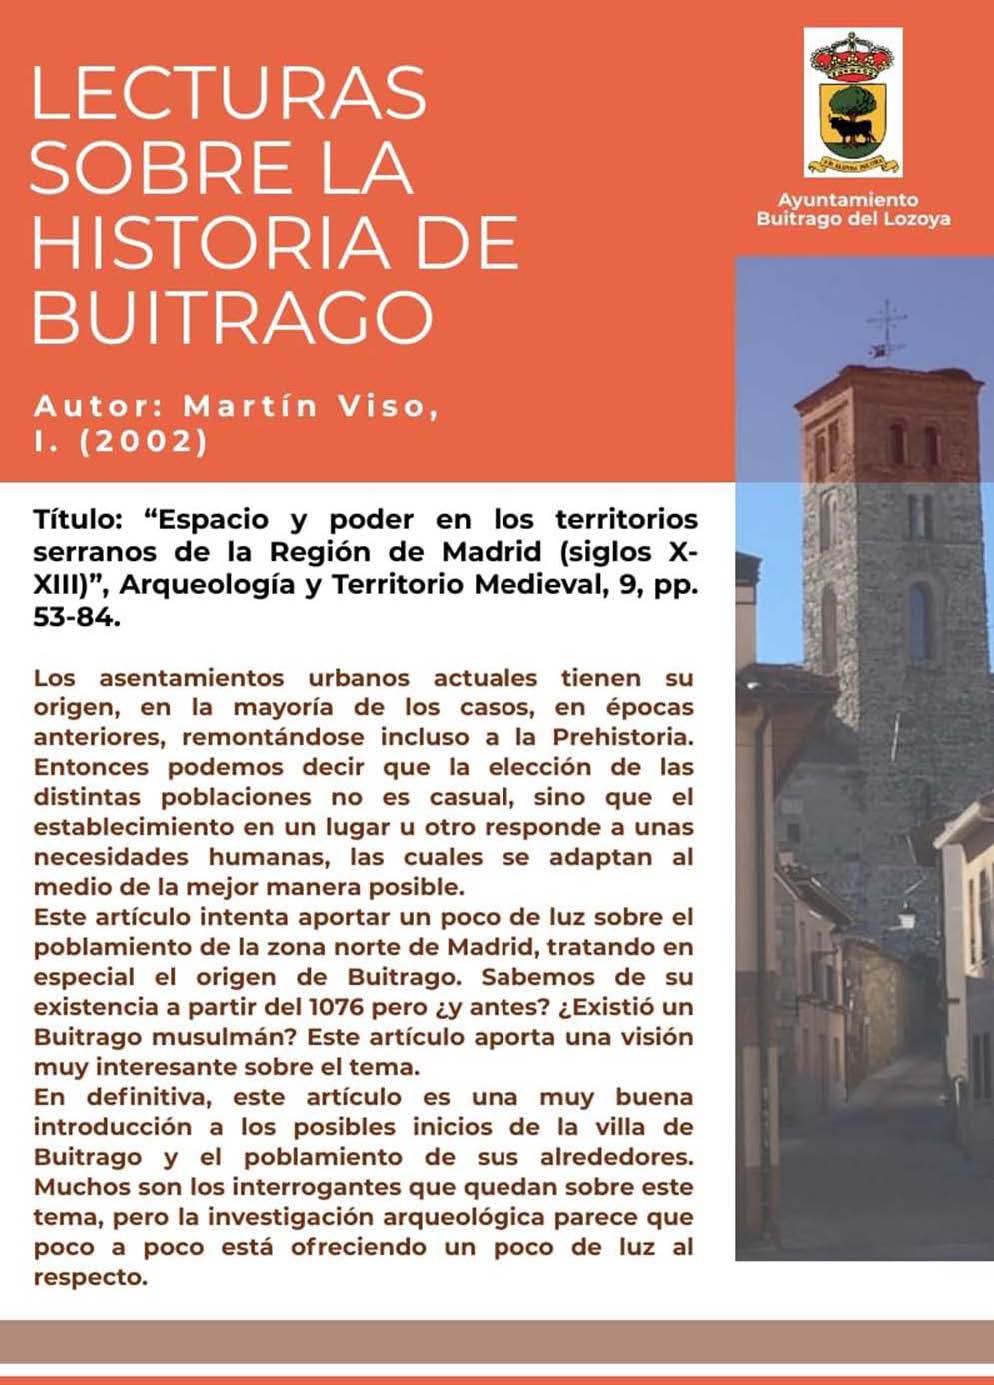 Lecturas sobre la historia de Buitrago